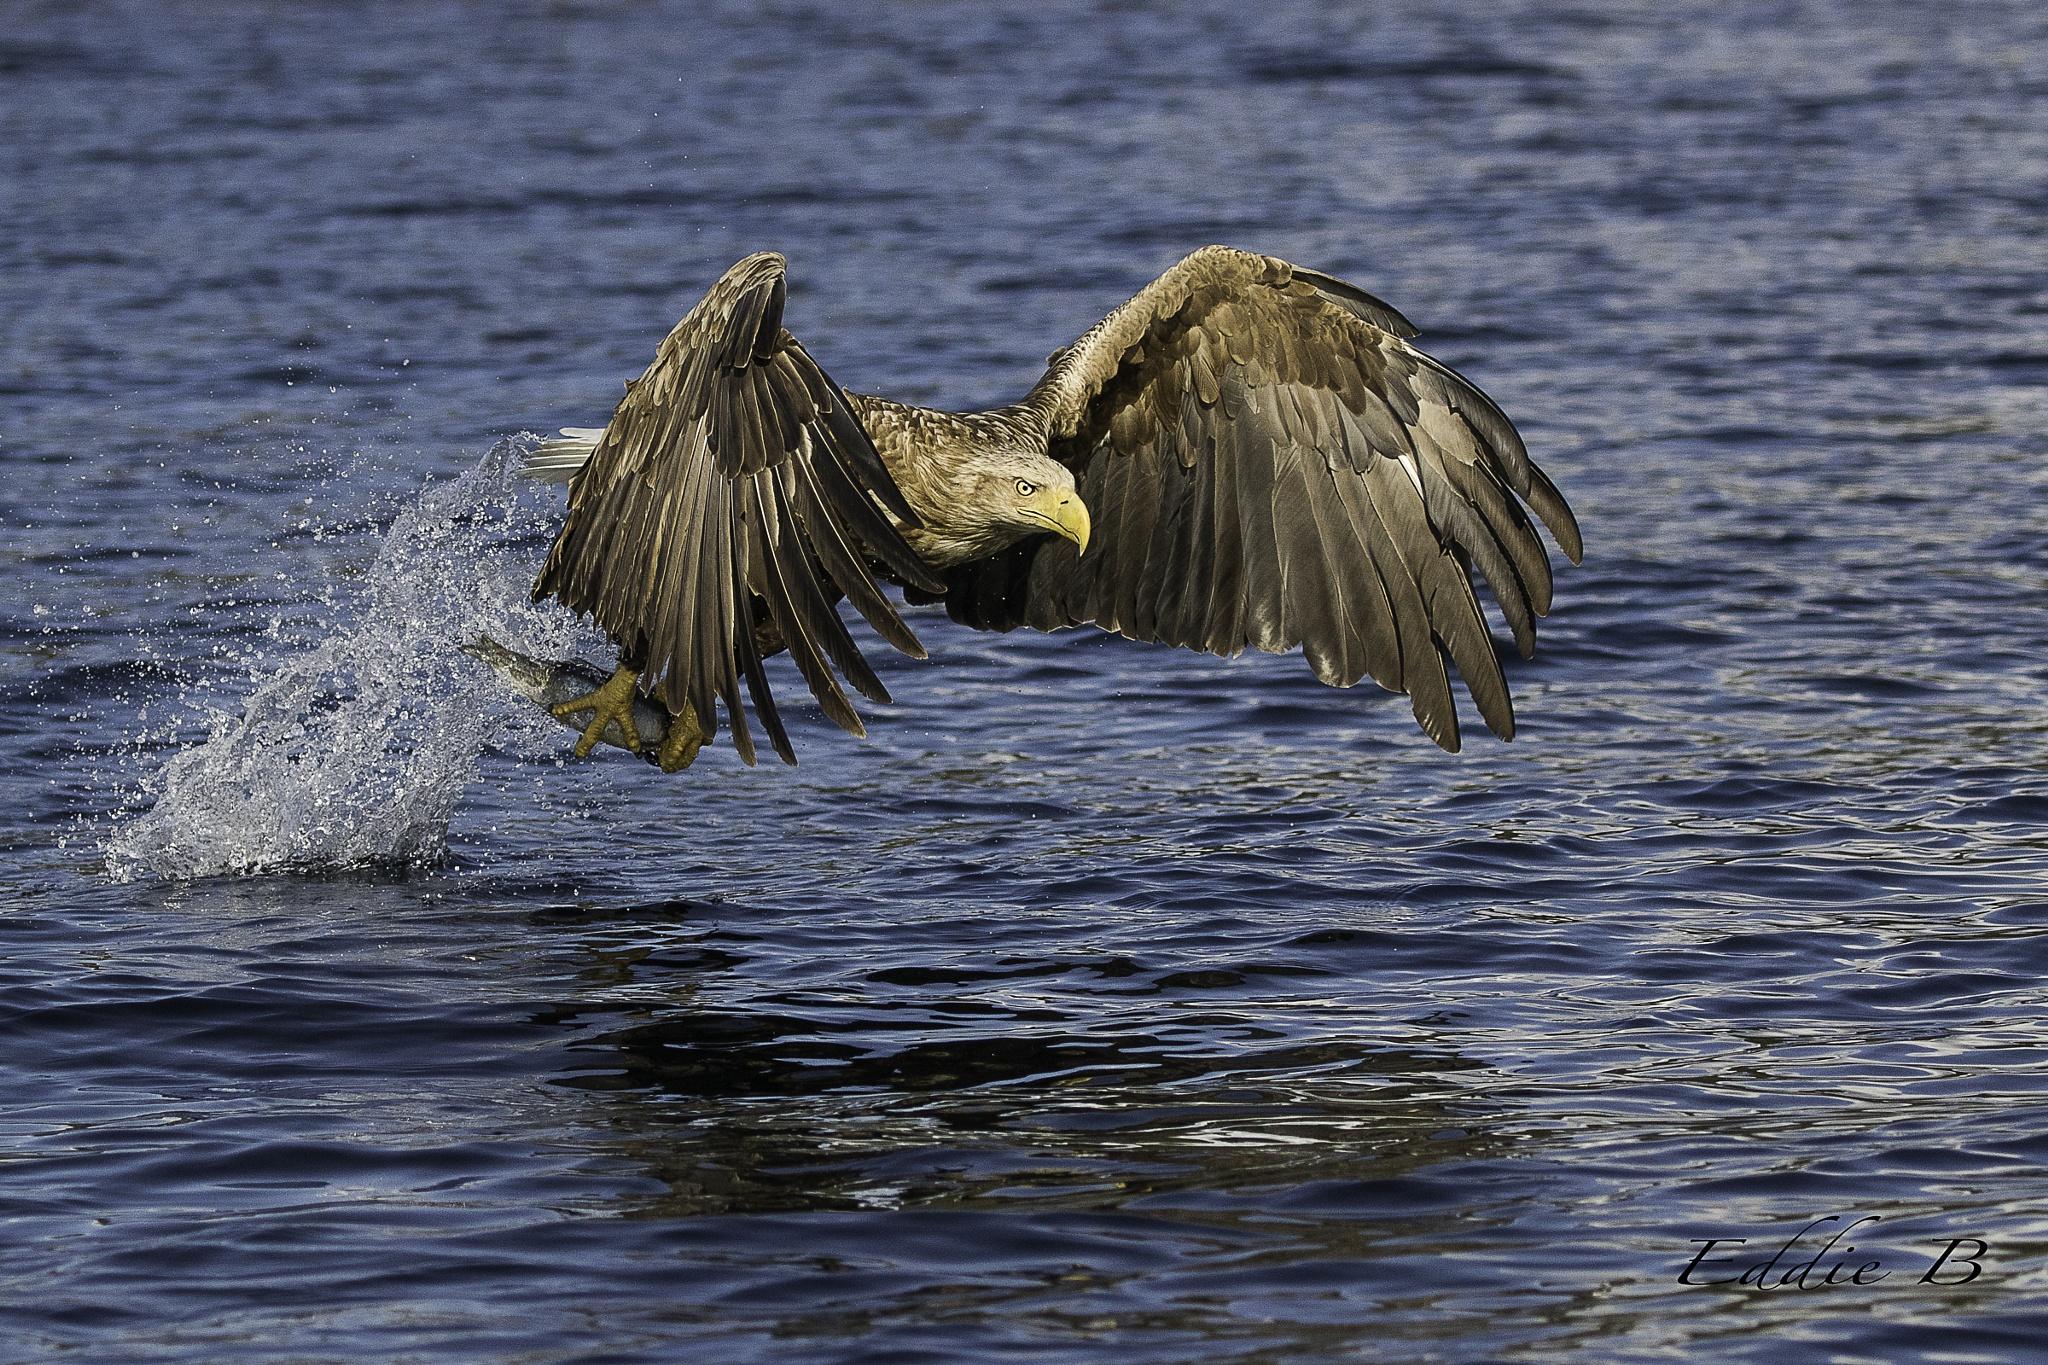 White tailed eagle taking fish. by EddieB